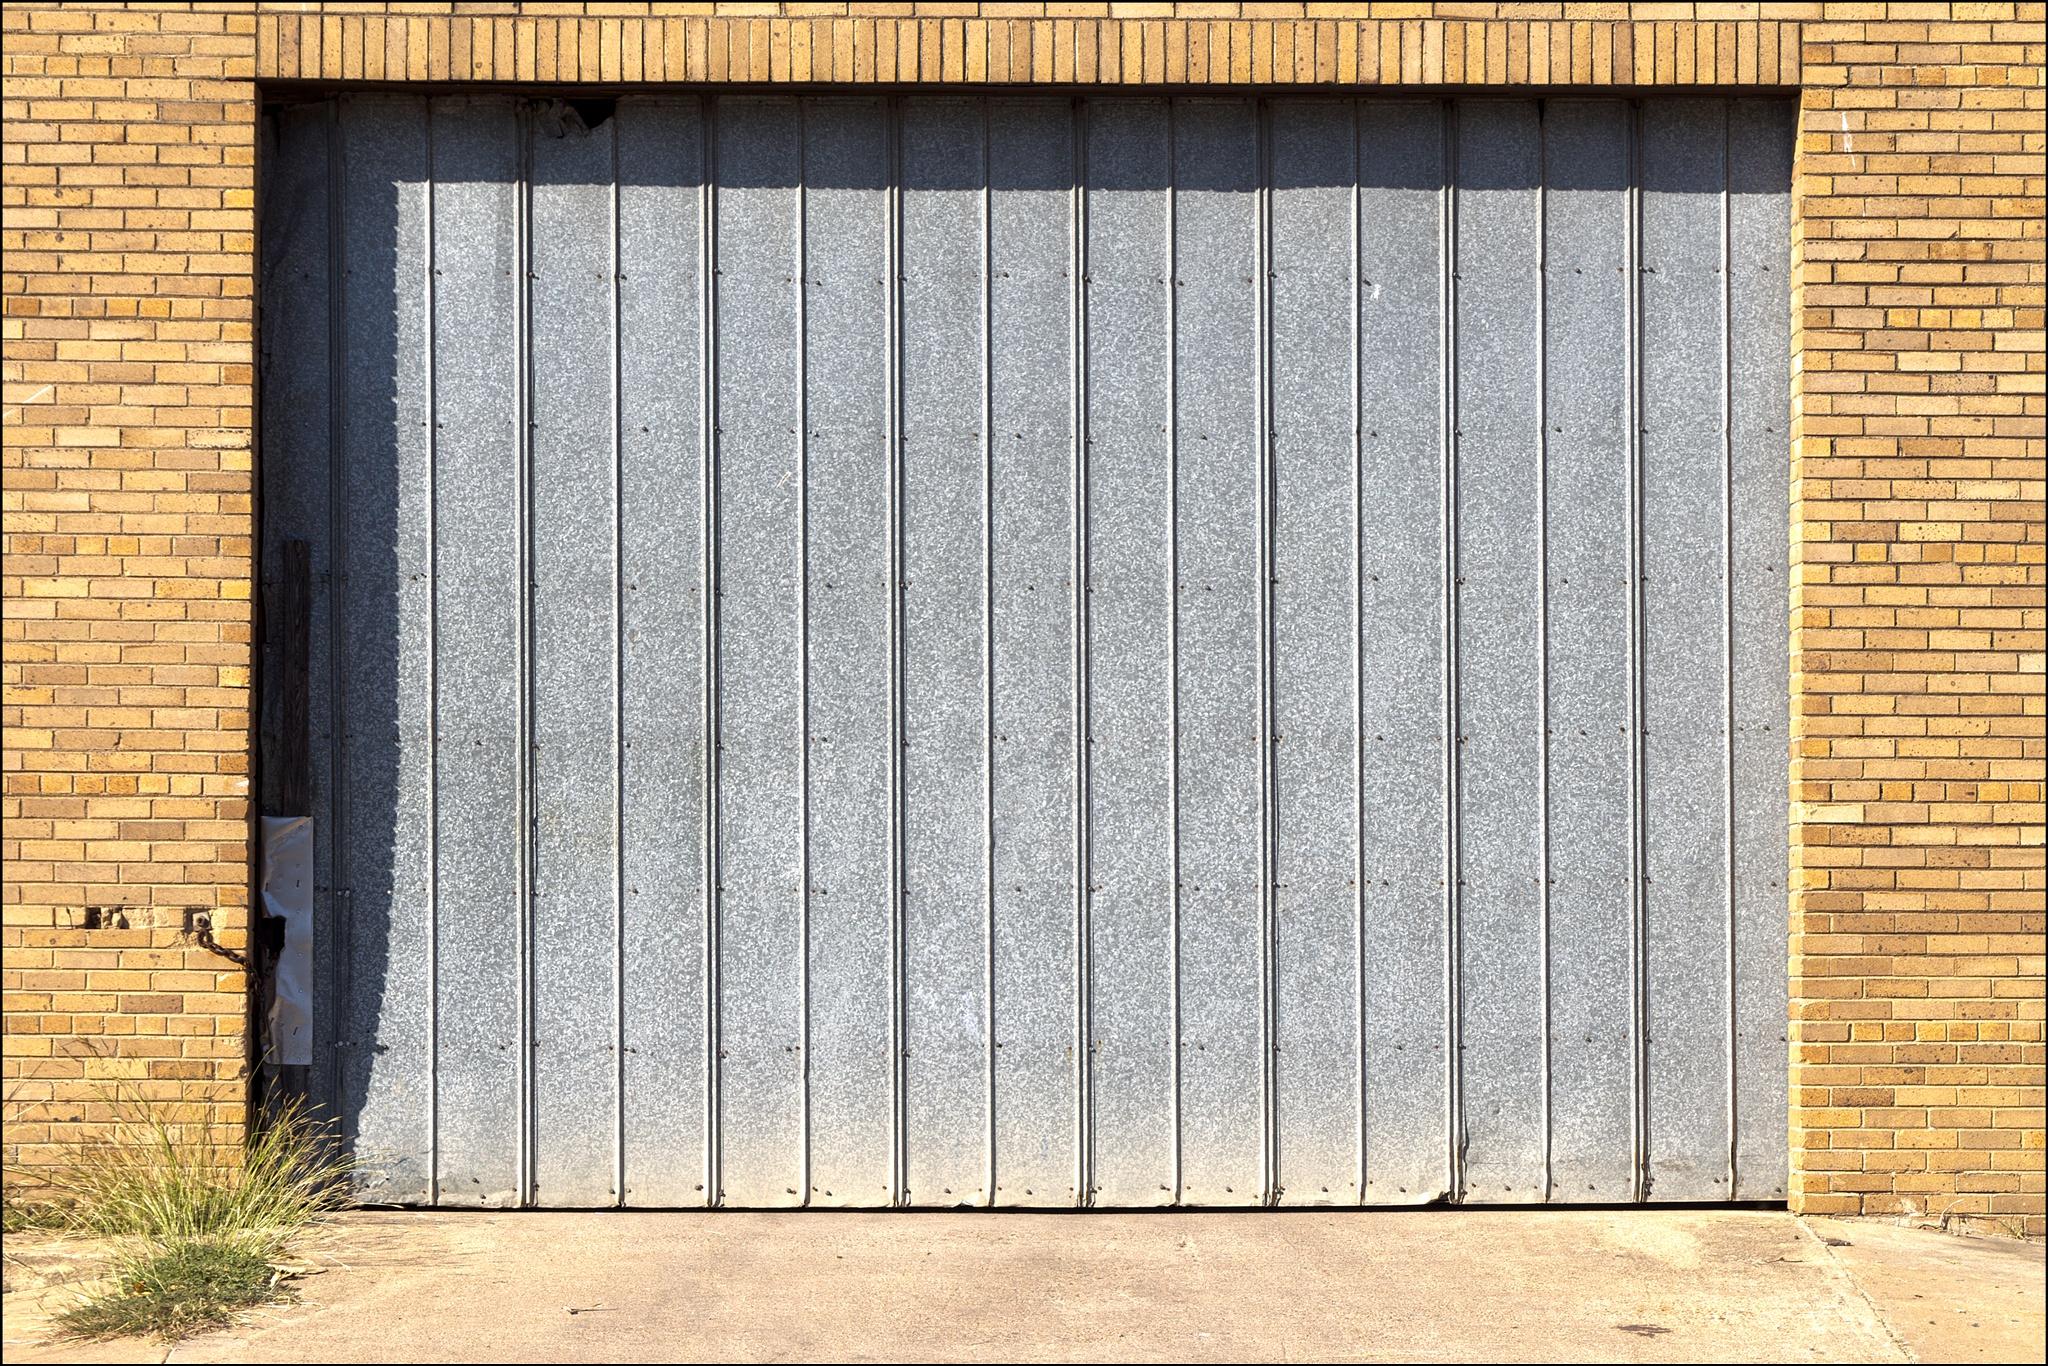 Brick & Iron - Vertical / Horizontal by Ozroo